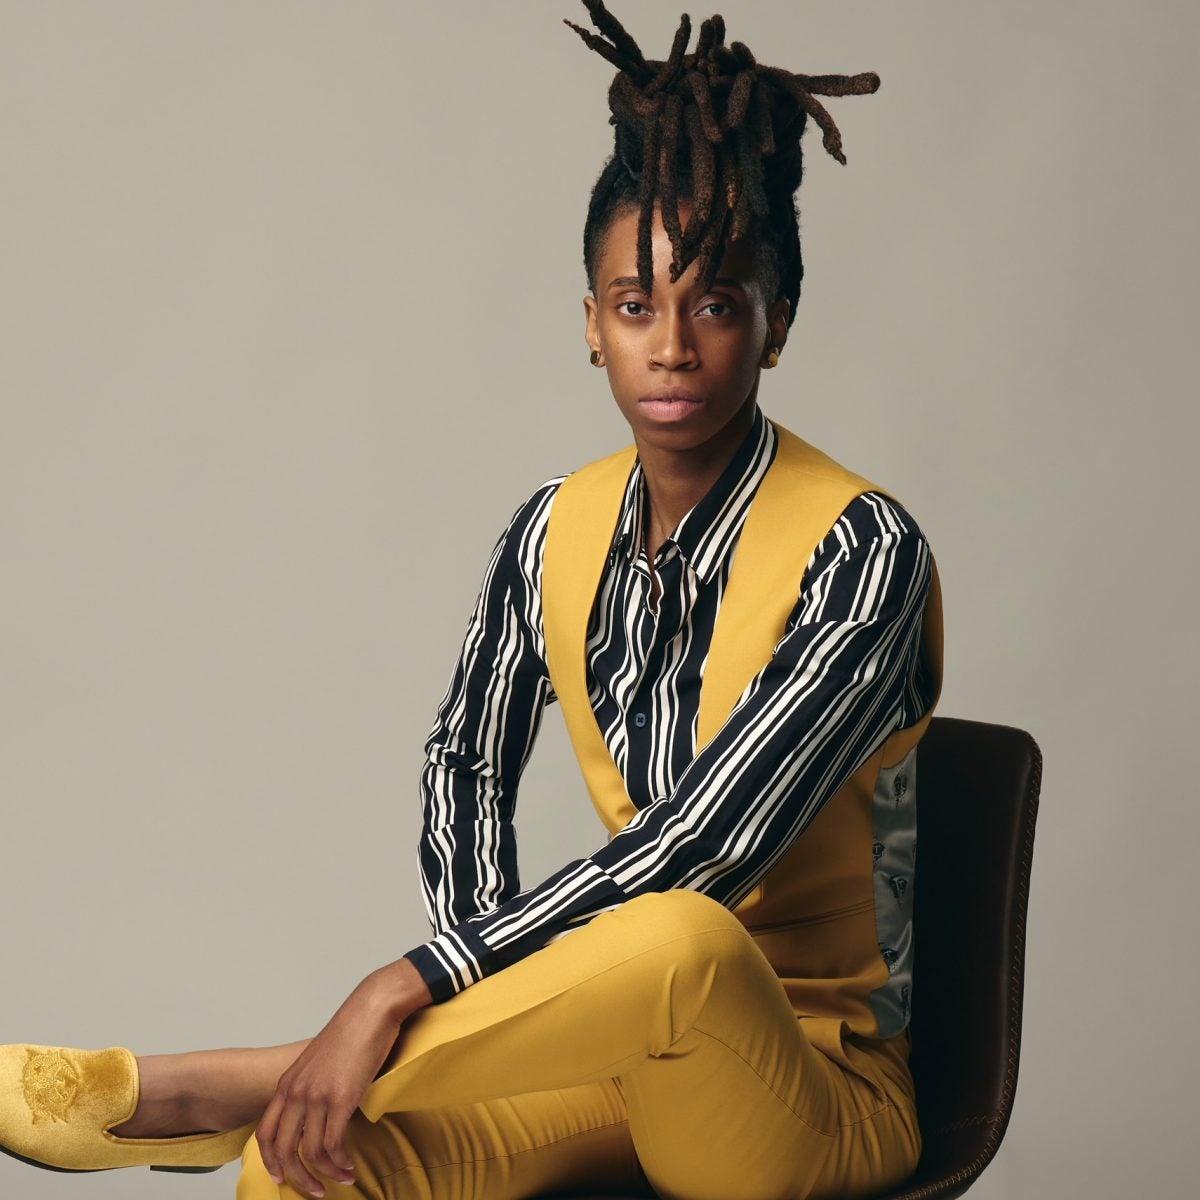 Ganesia Wveighlin Is The Youngest, Black Female Luxury Shoe Designer